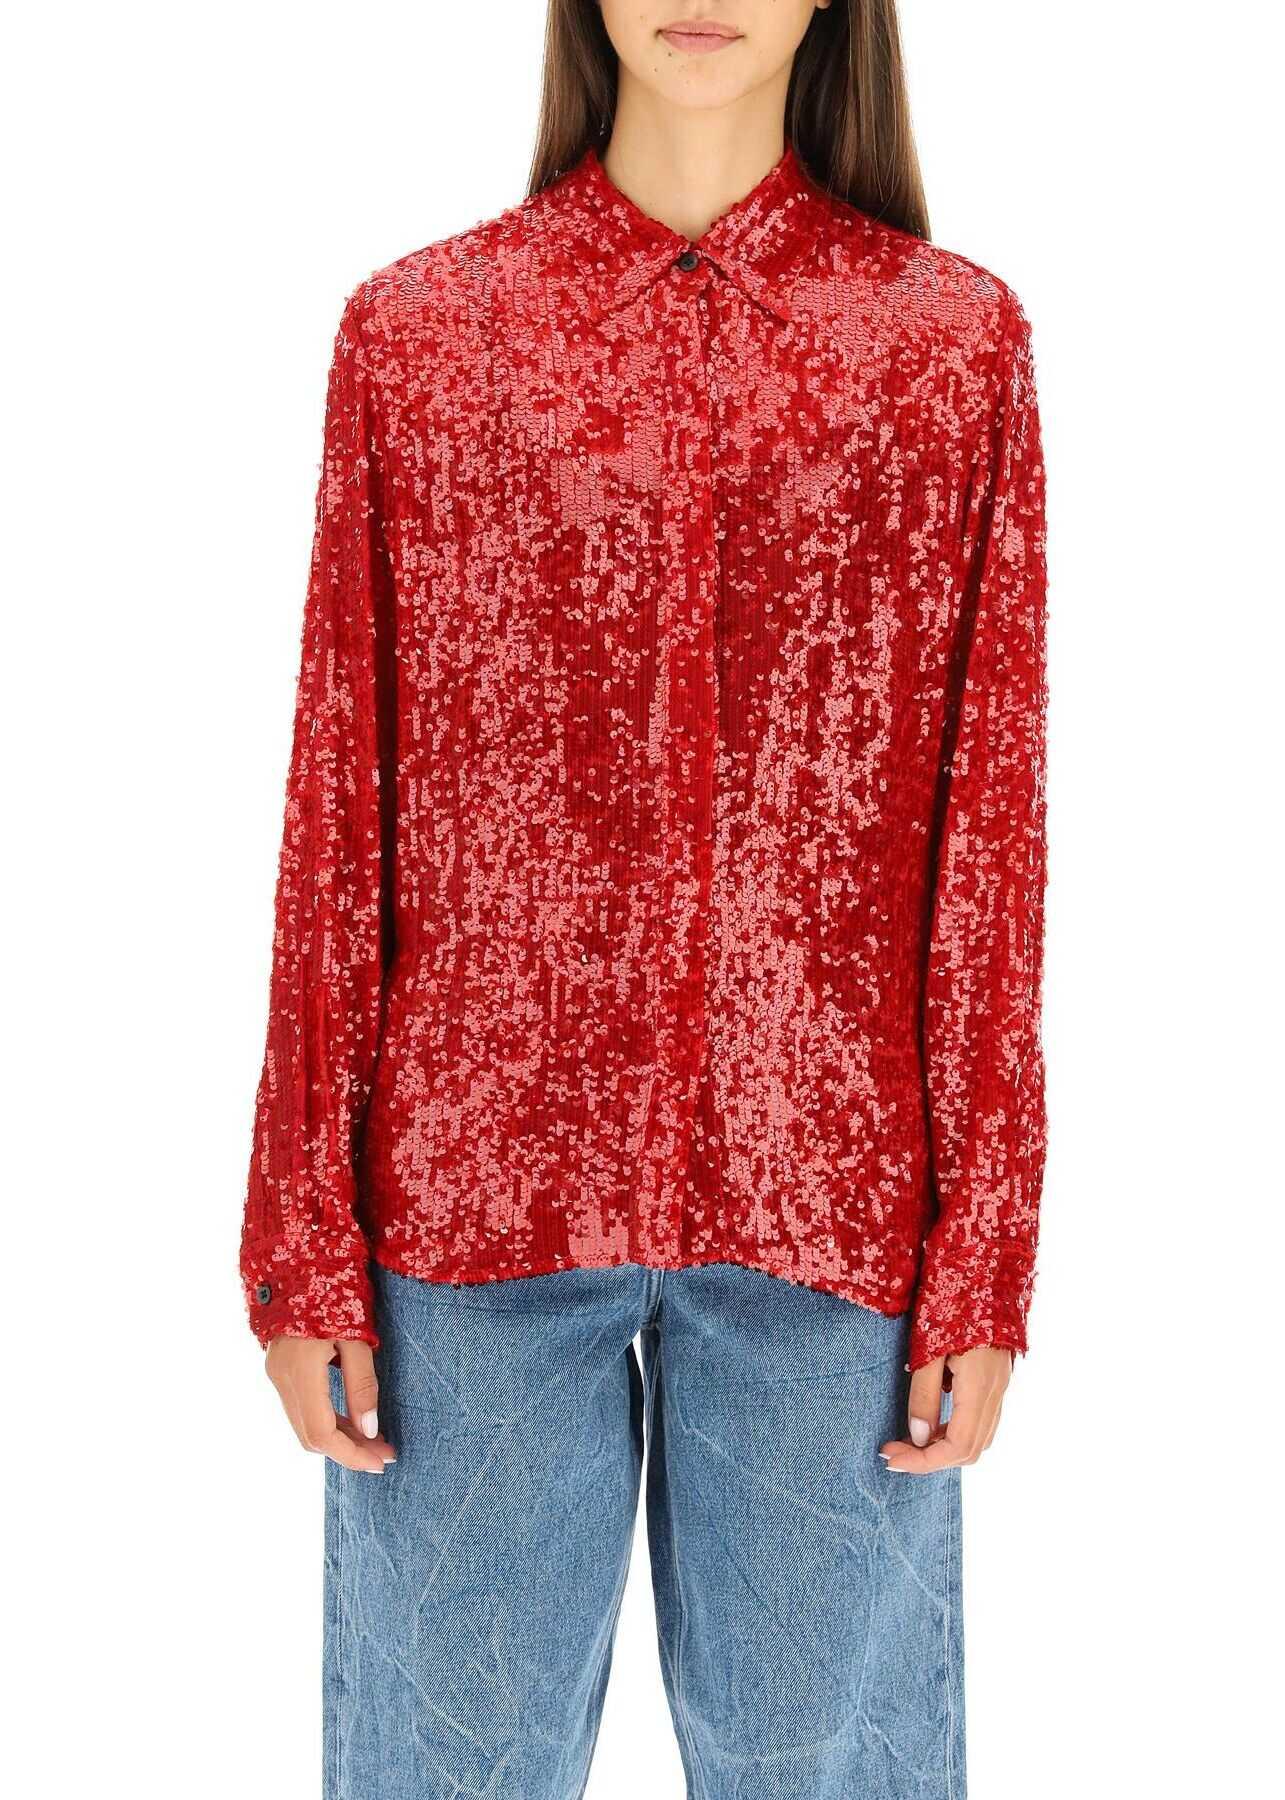 Dries Van Noten Sequined Shirt CHOW EMB 3223 RED image0